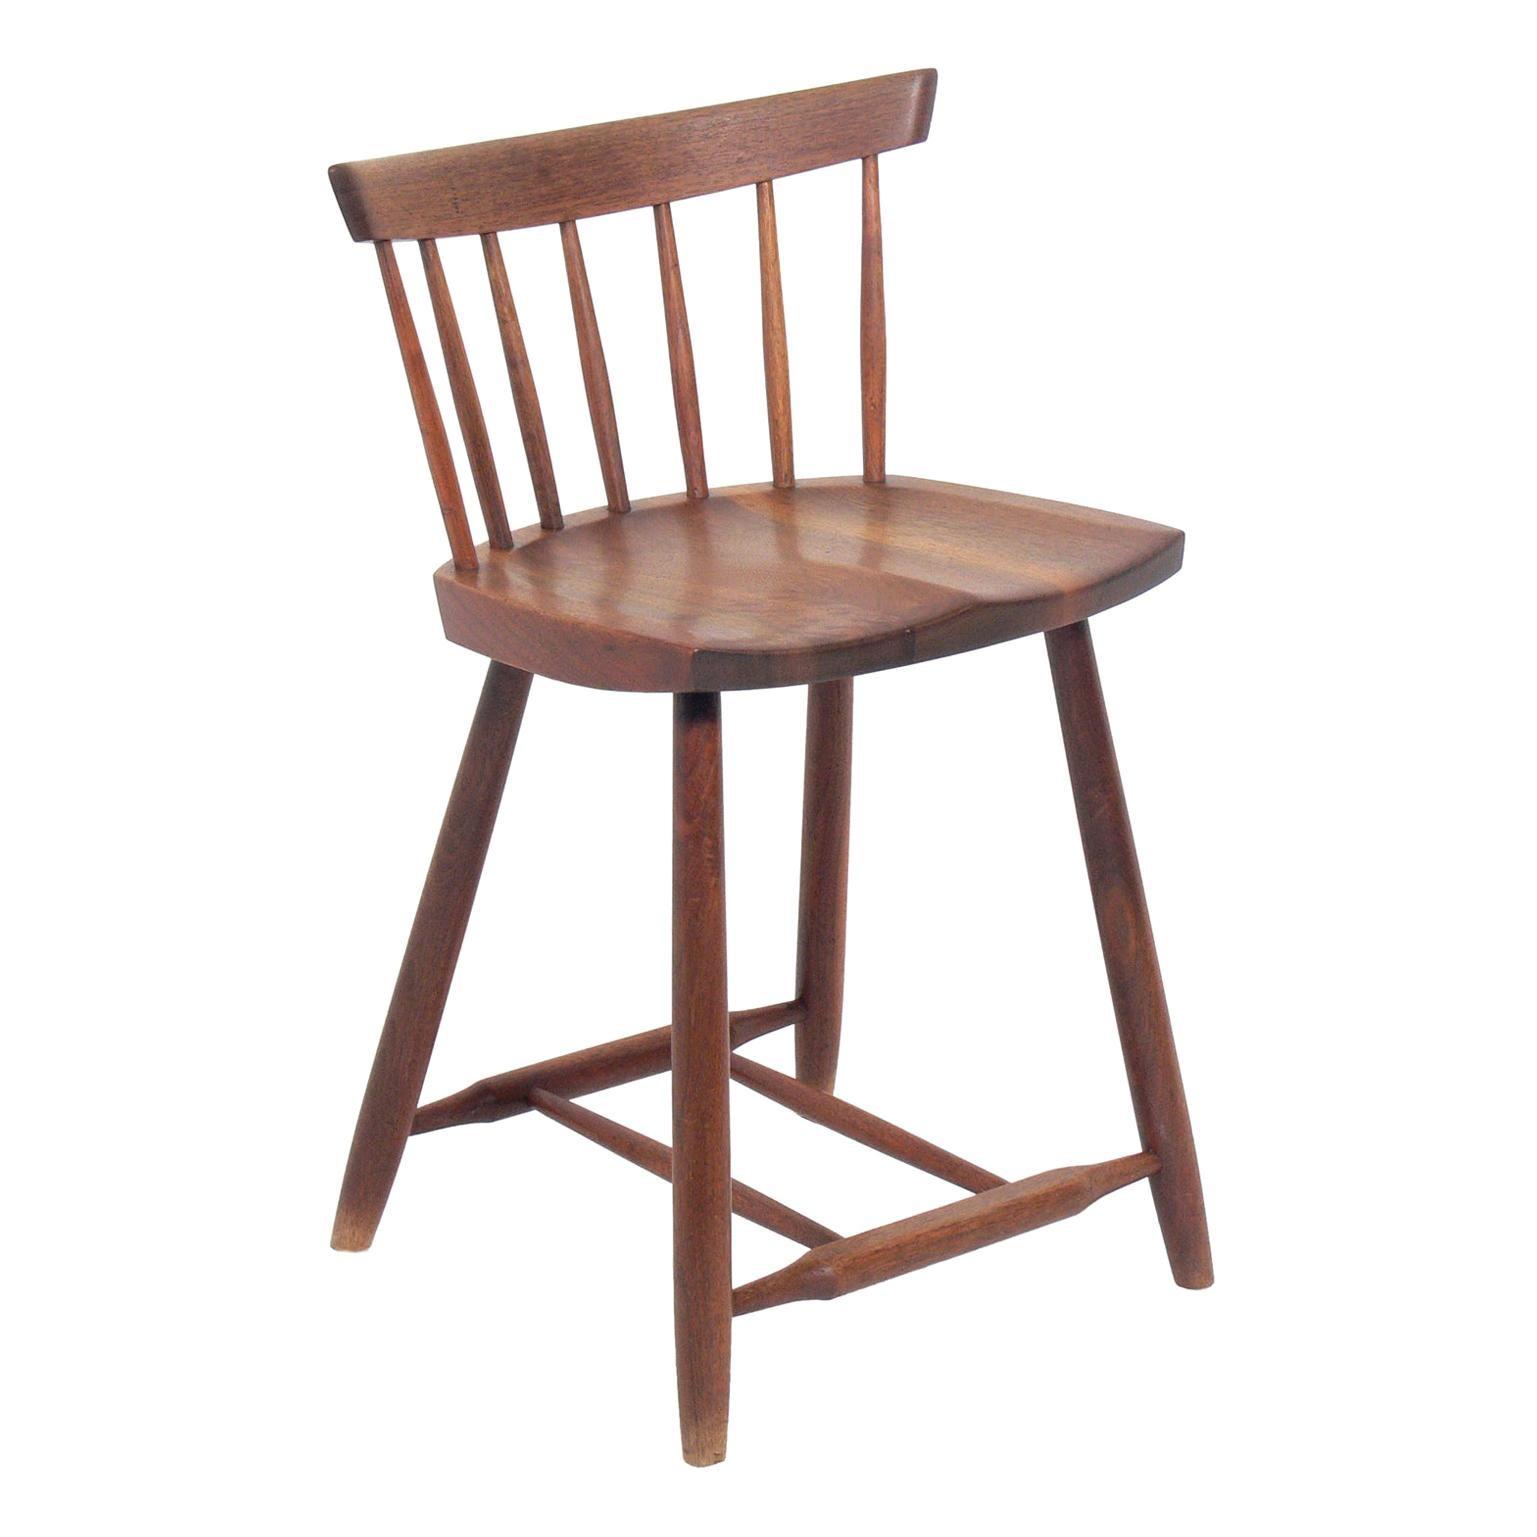 George Nakashima Chair